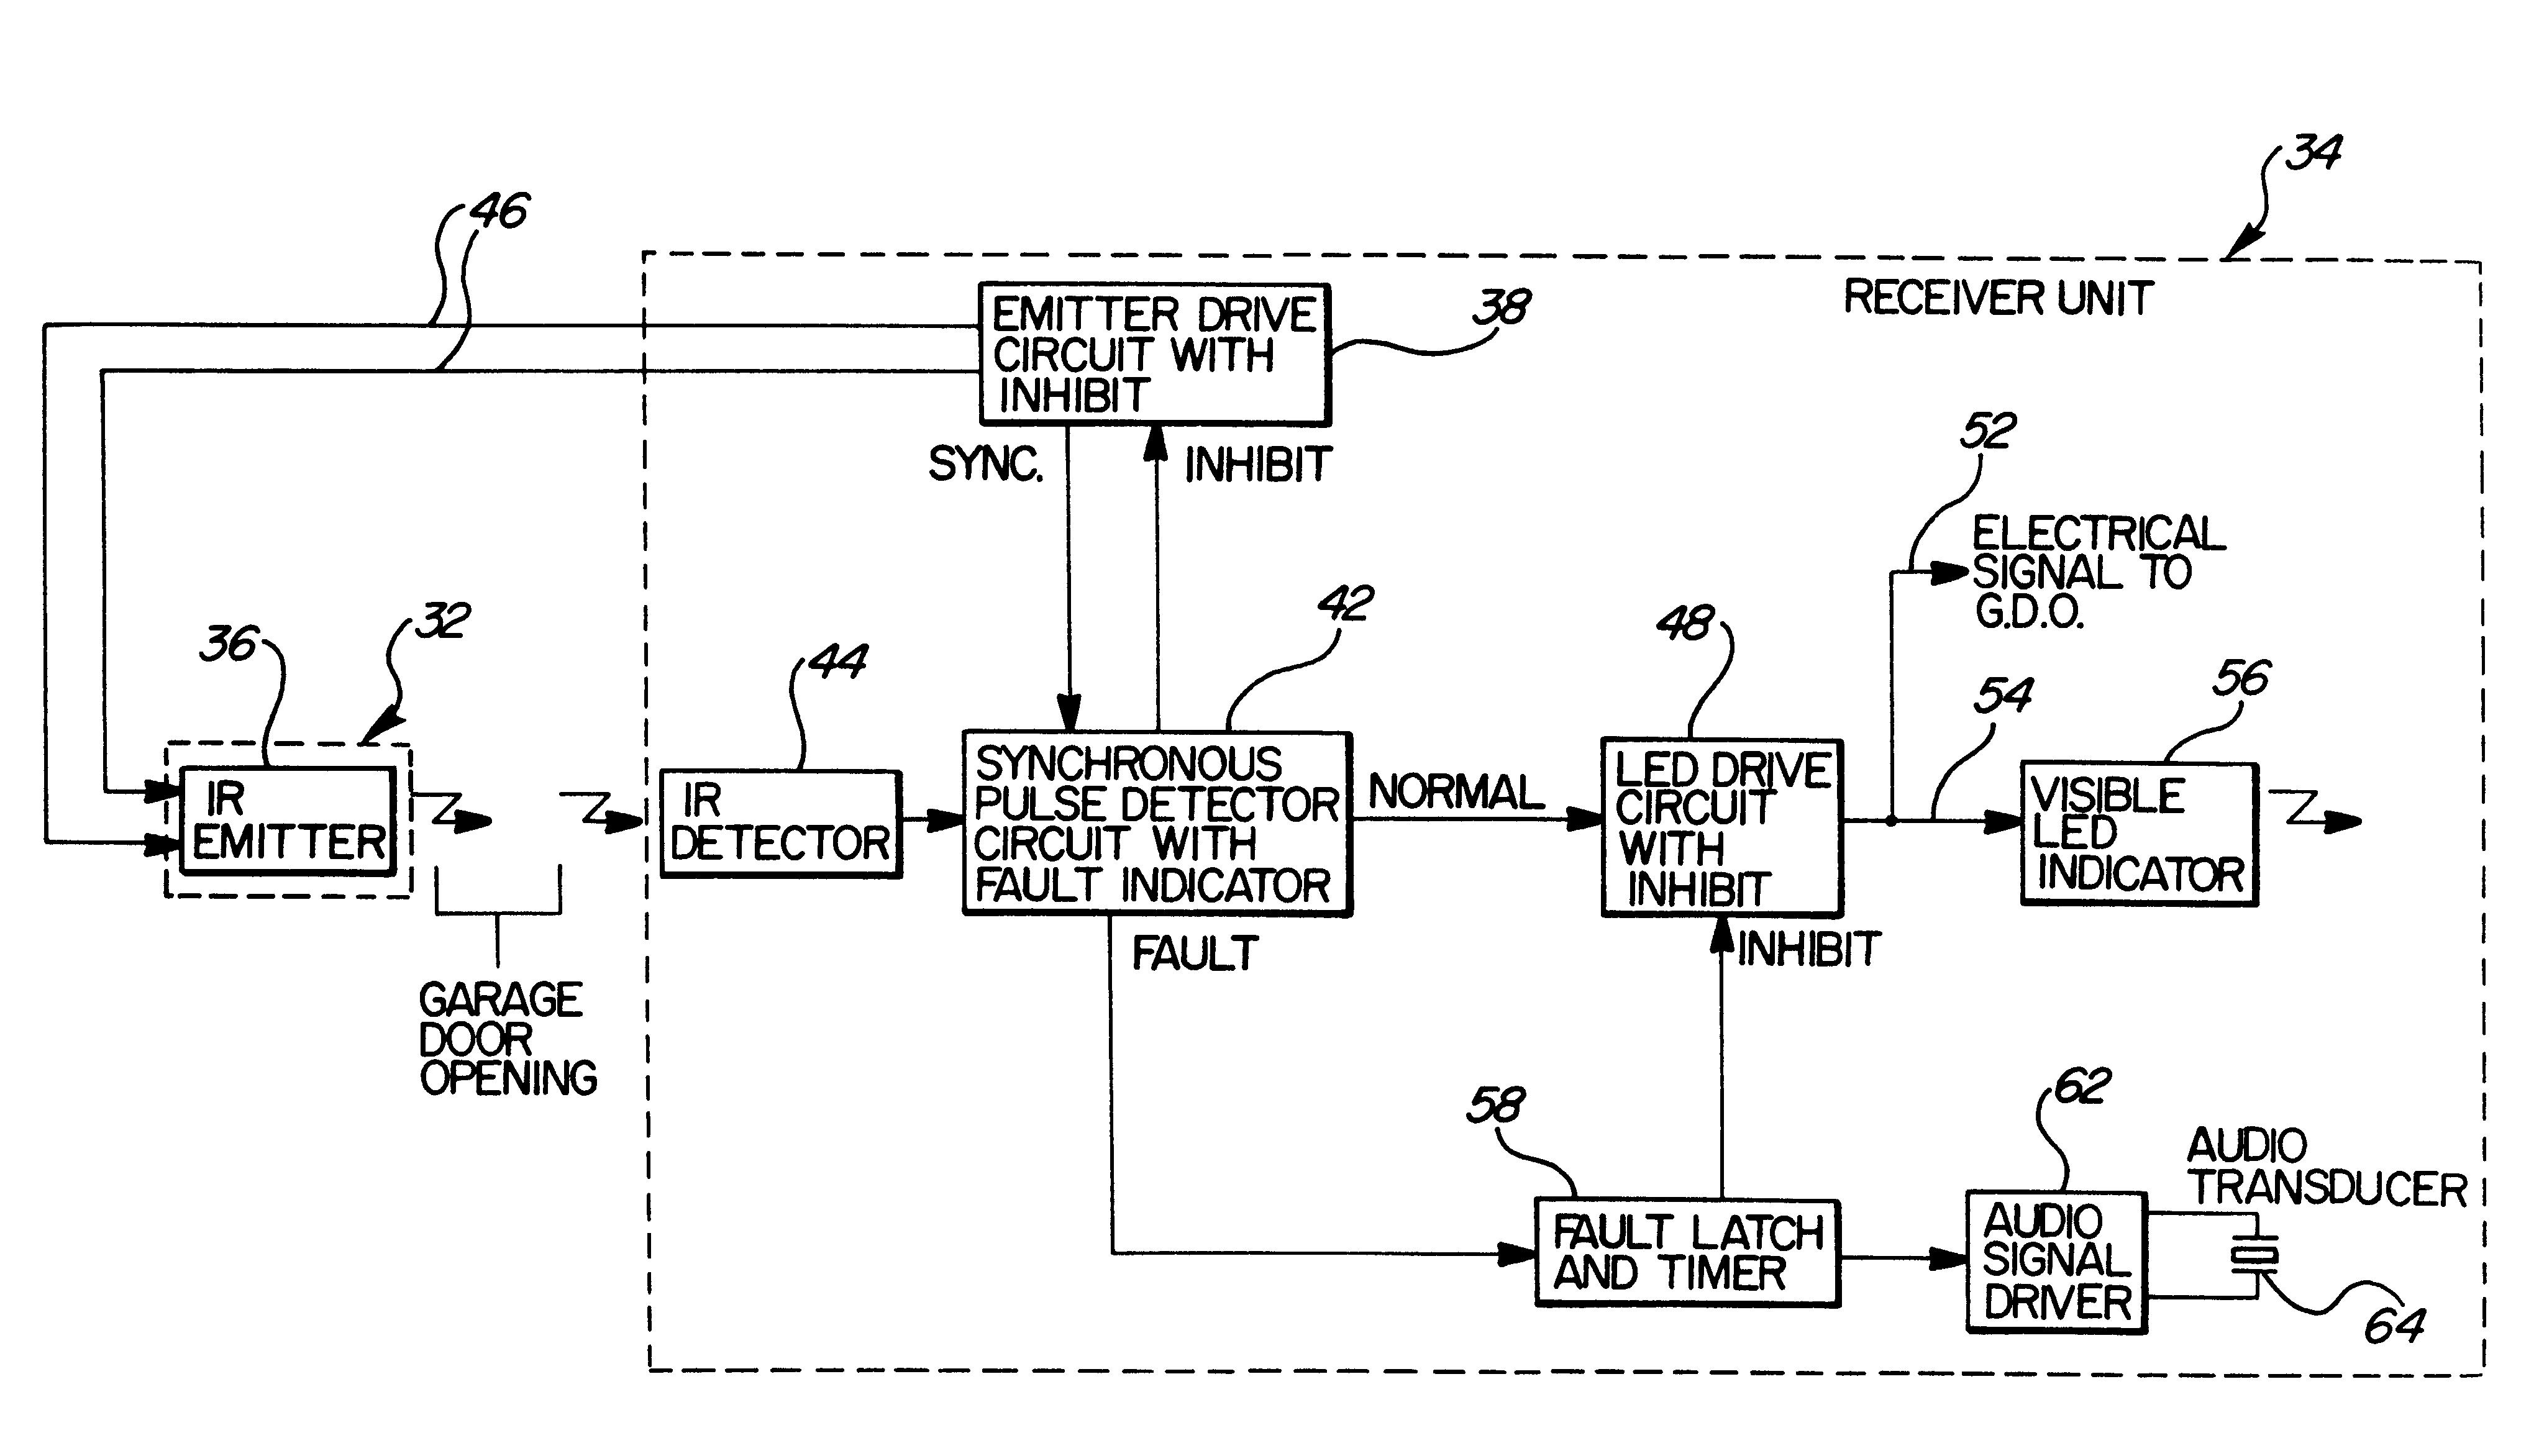 garage door sensor wiring diagram collection wiring. Black Bedroom Furniture Sets. Home Design Ideas